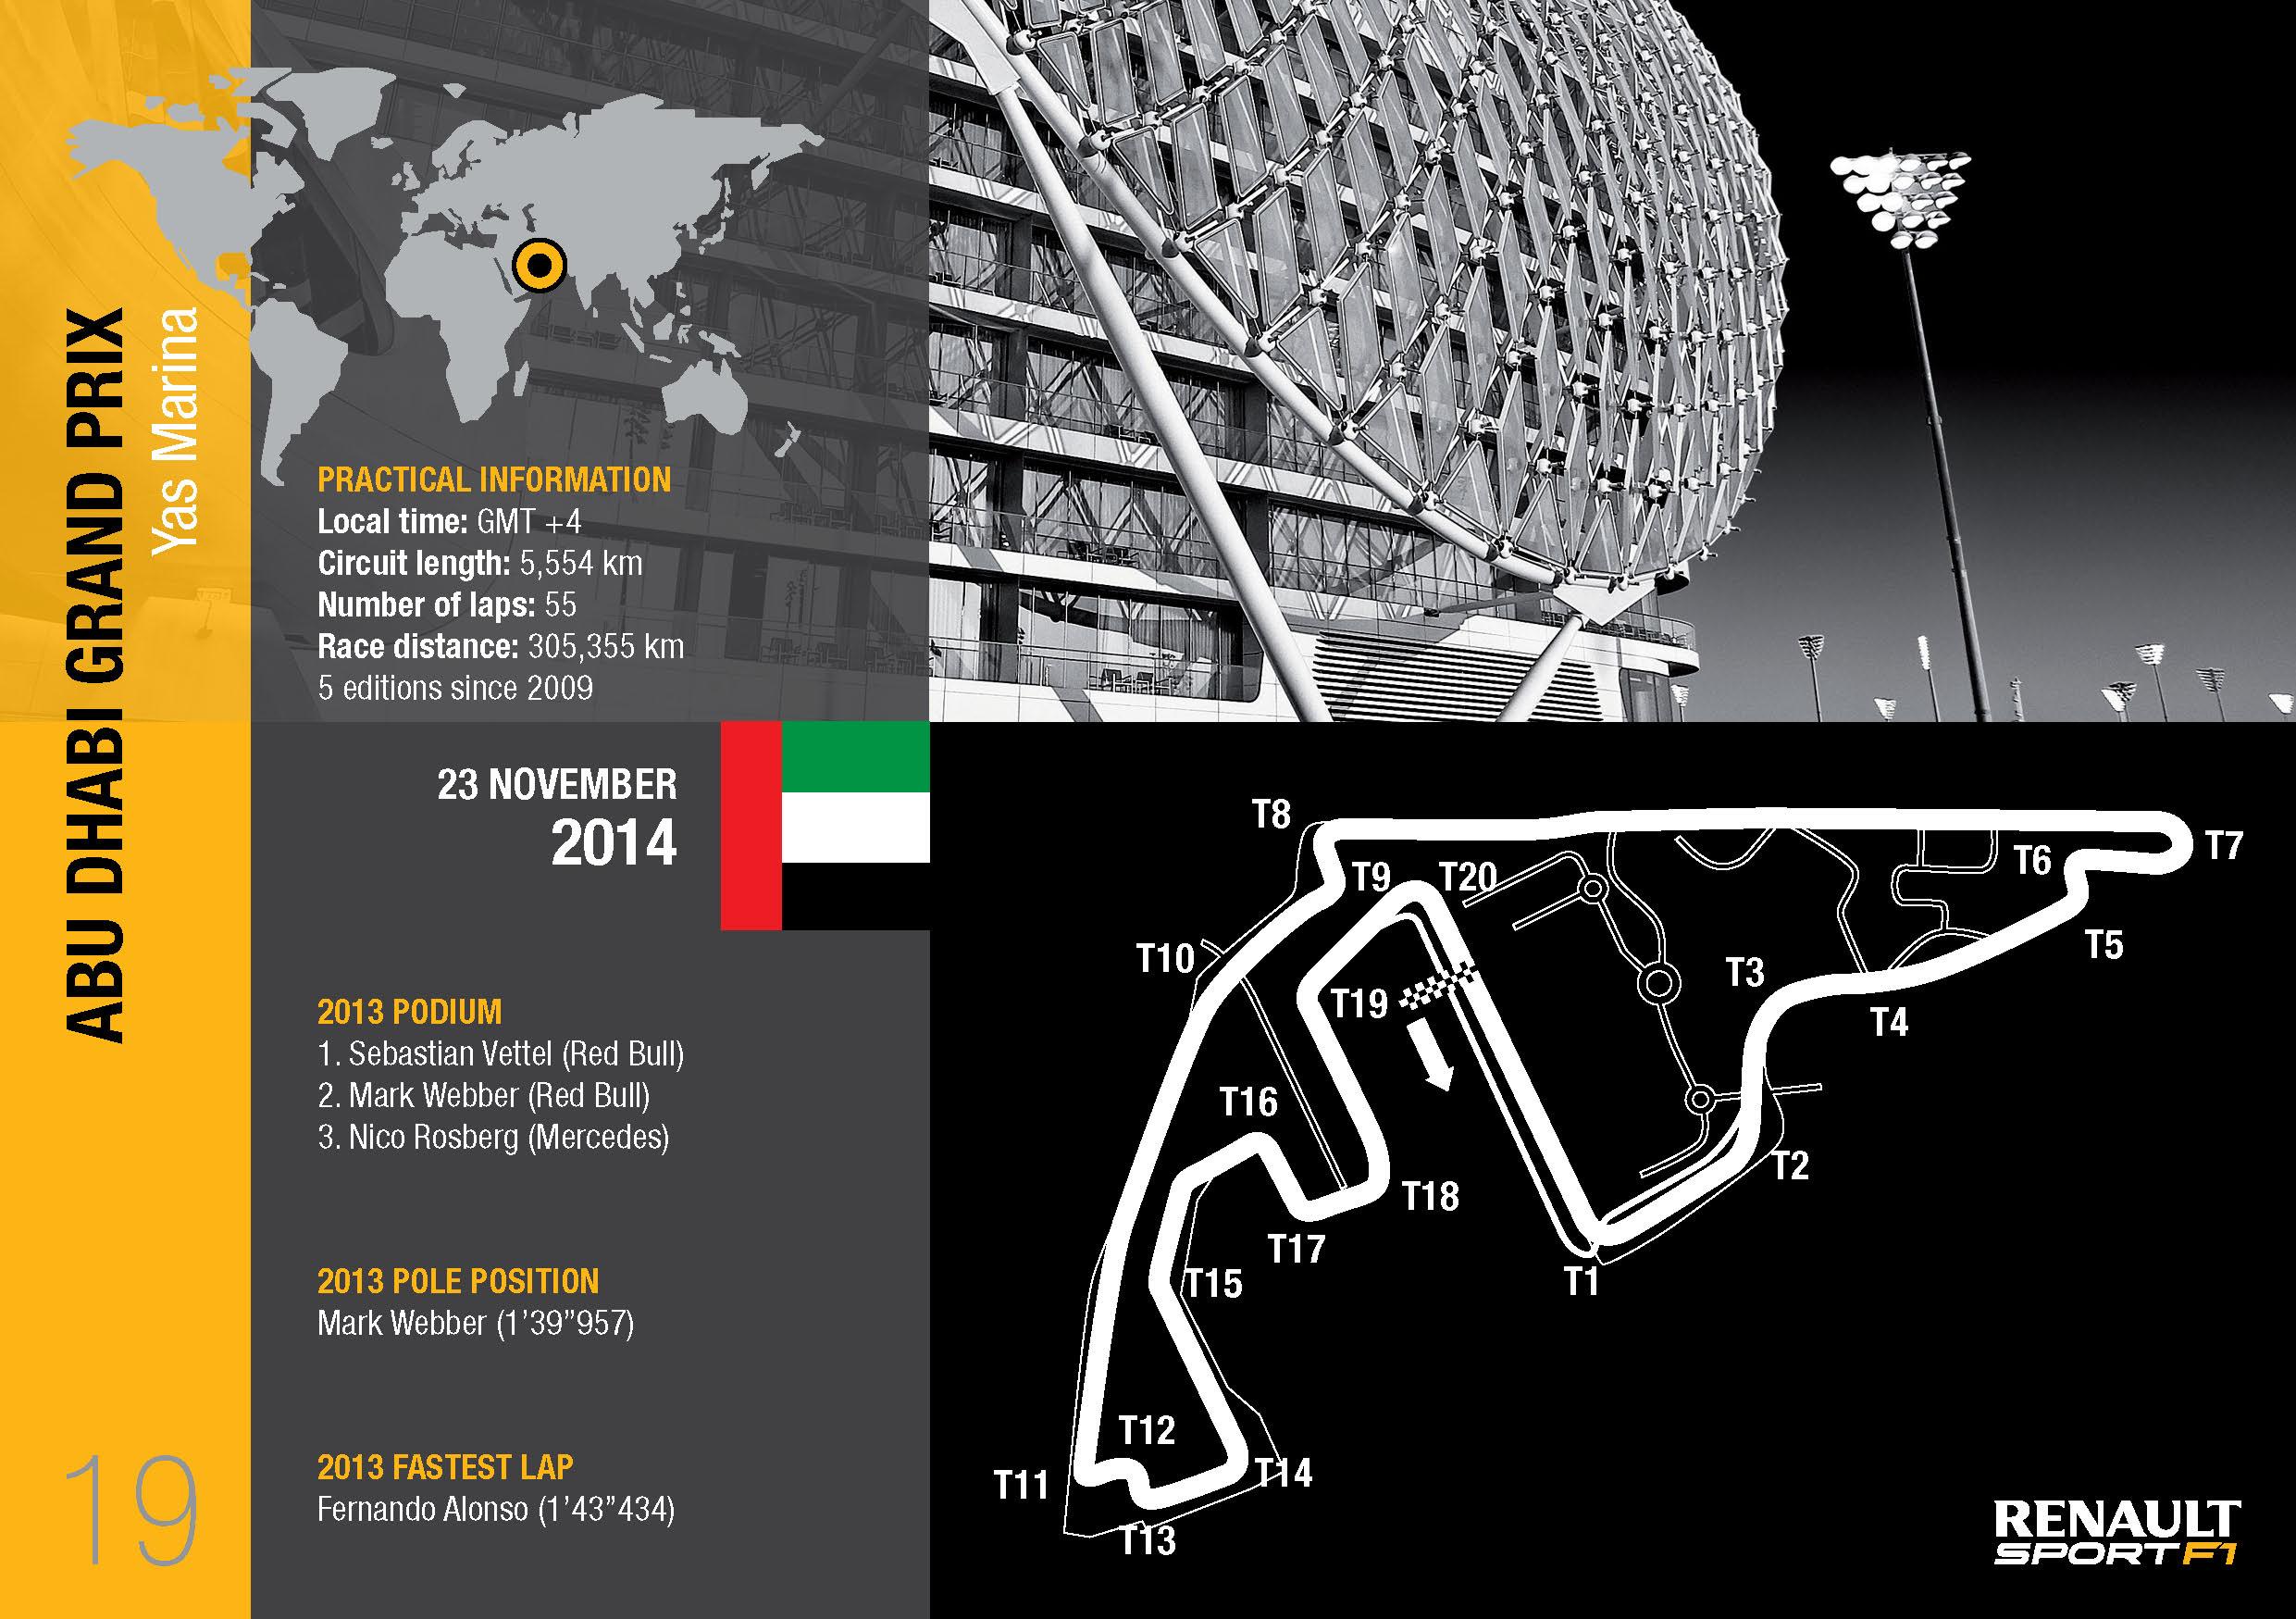 GP di Abu Dhabi: anteprima Renault Sport F1